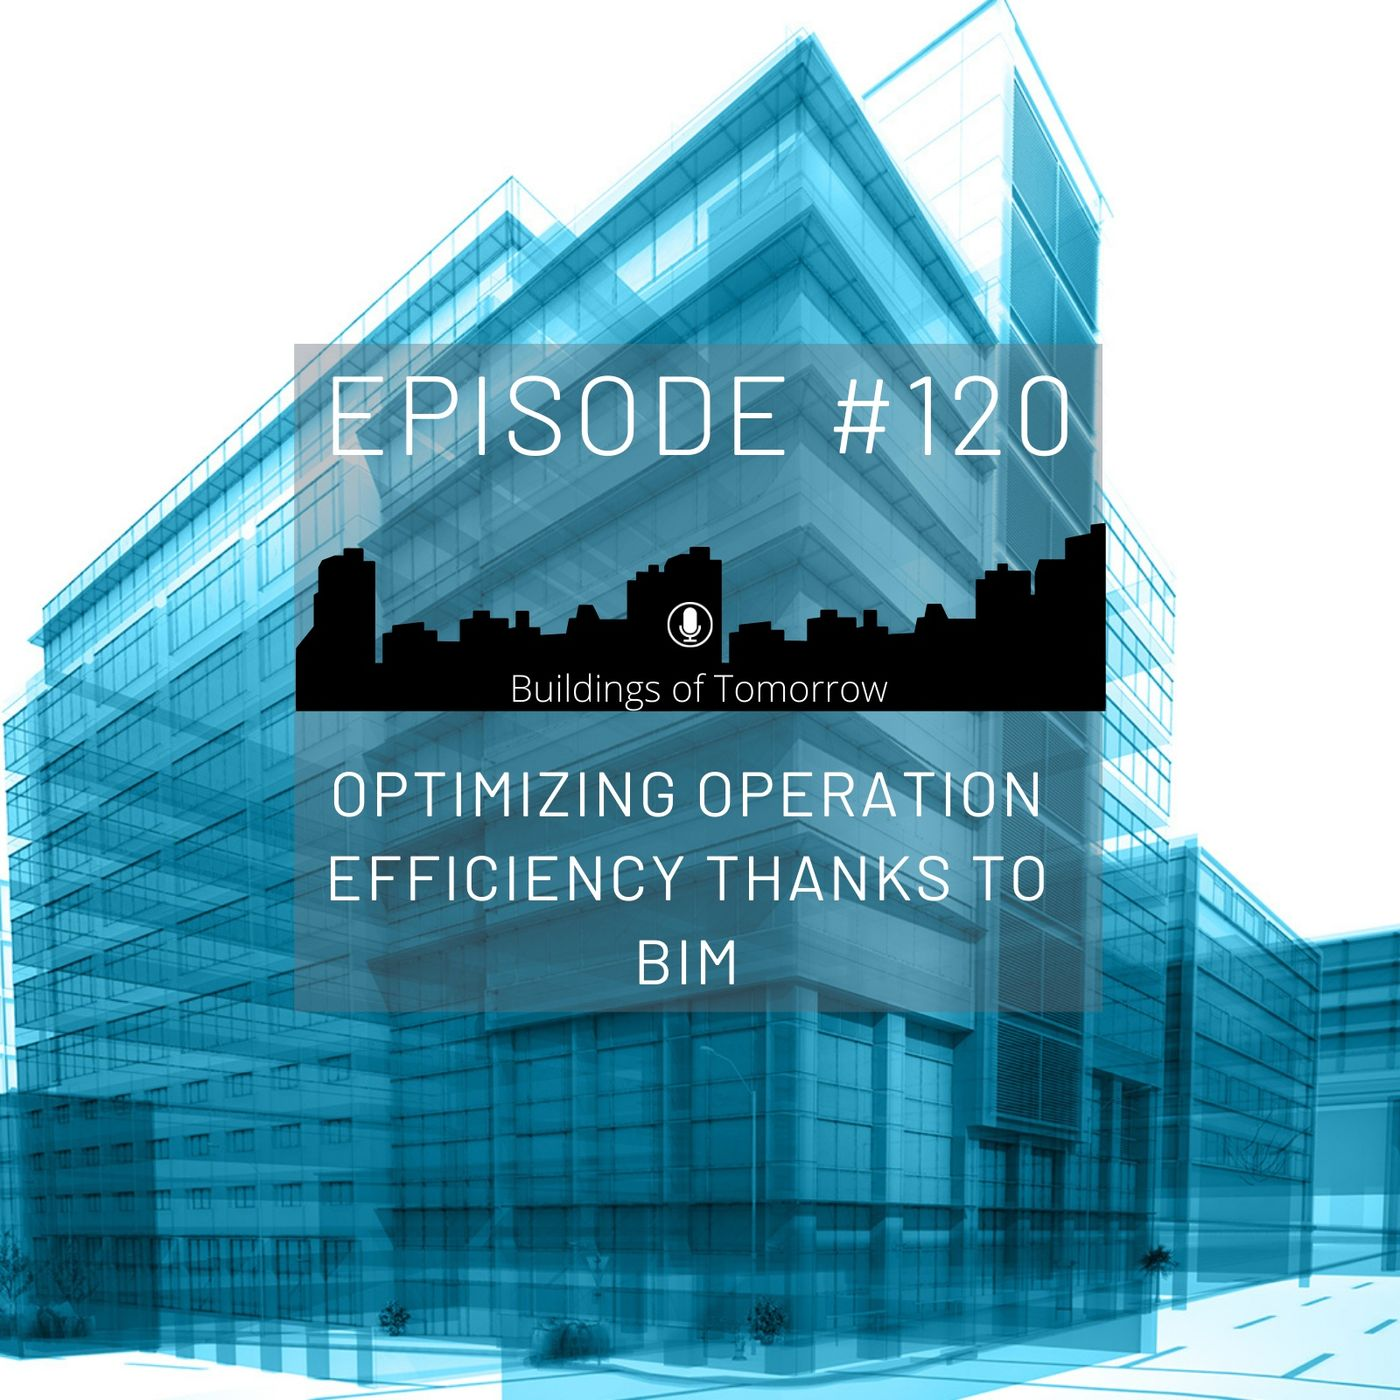 #120 Optimizing operation efficiency thanks to BIM